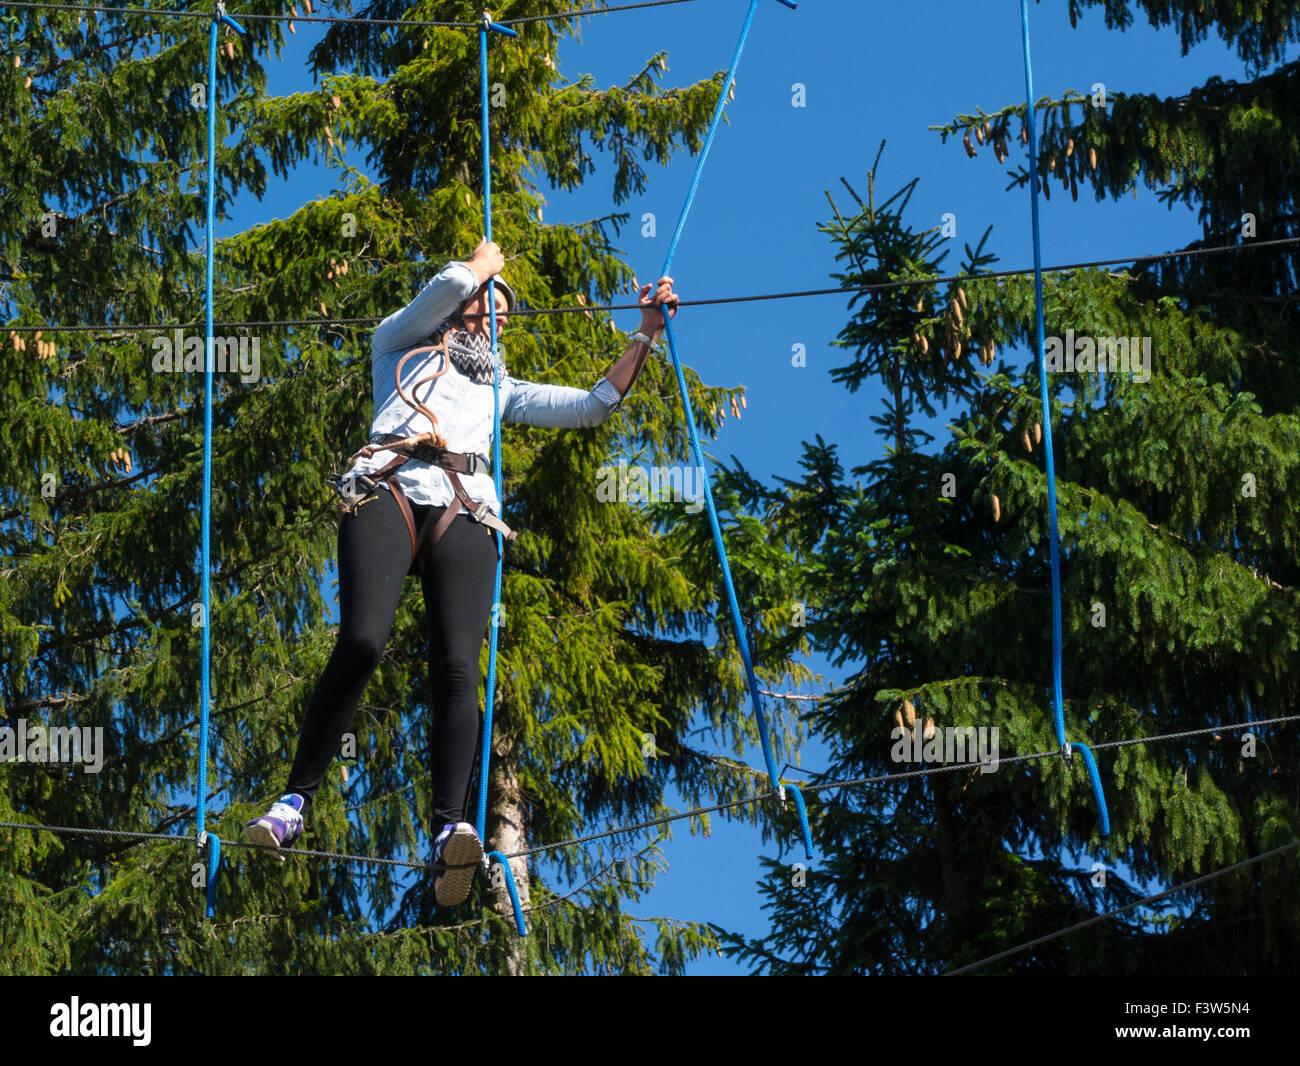 Young girl negotiating a rope walkway of  Trollandia Highwire Park Gubalowka Hill Zakopane Poland  excitement adrenalin - Stock Image